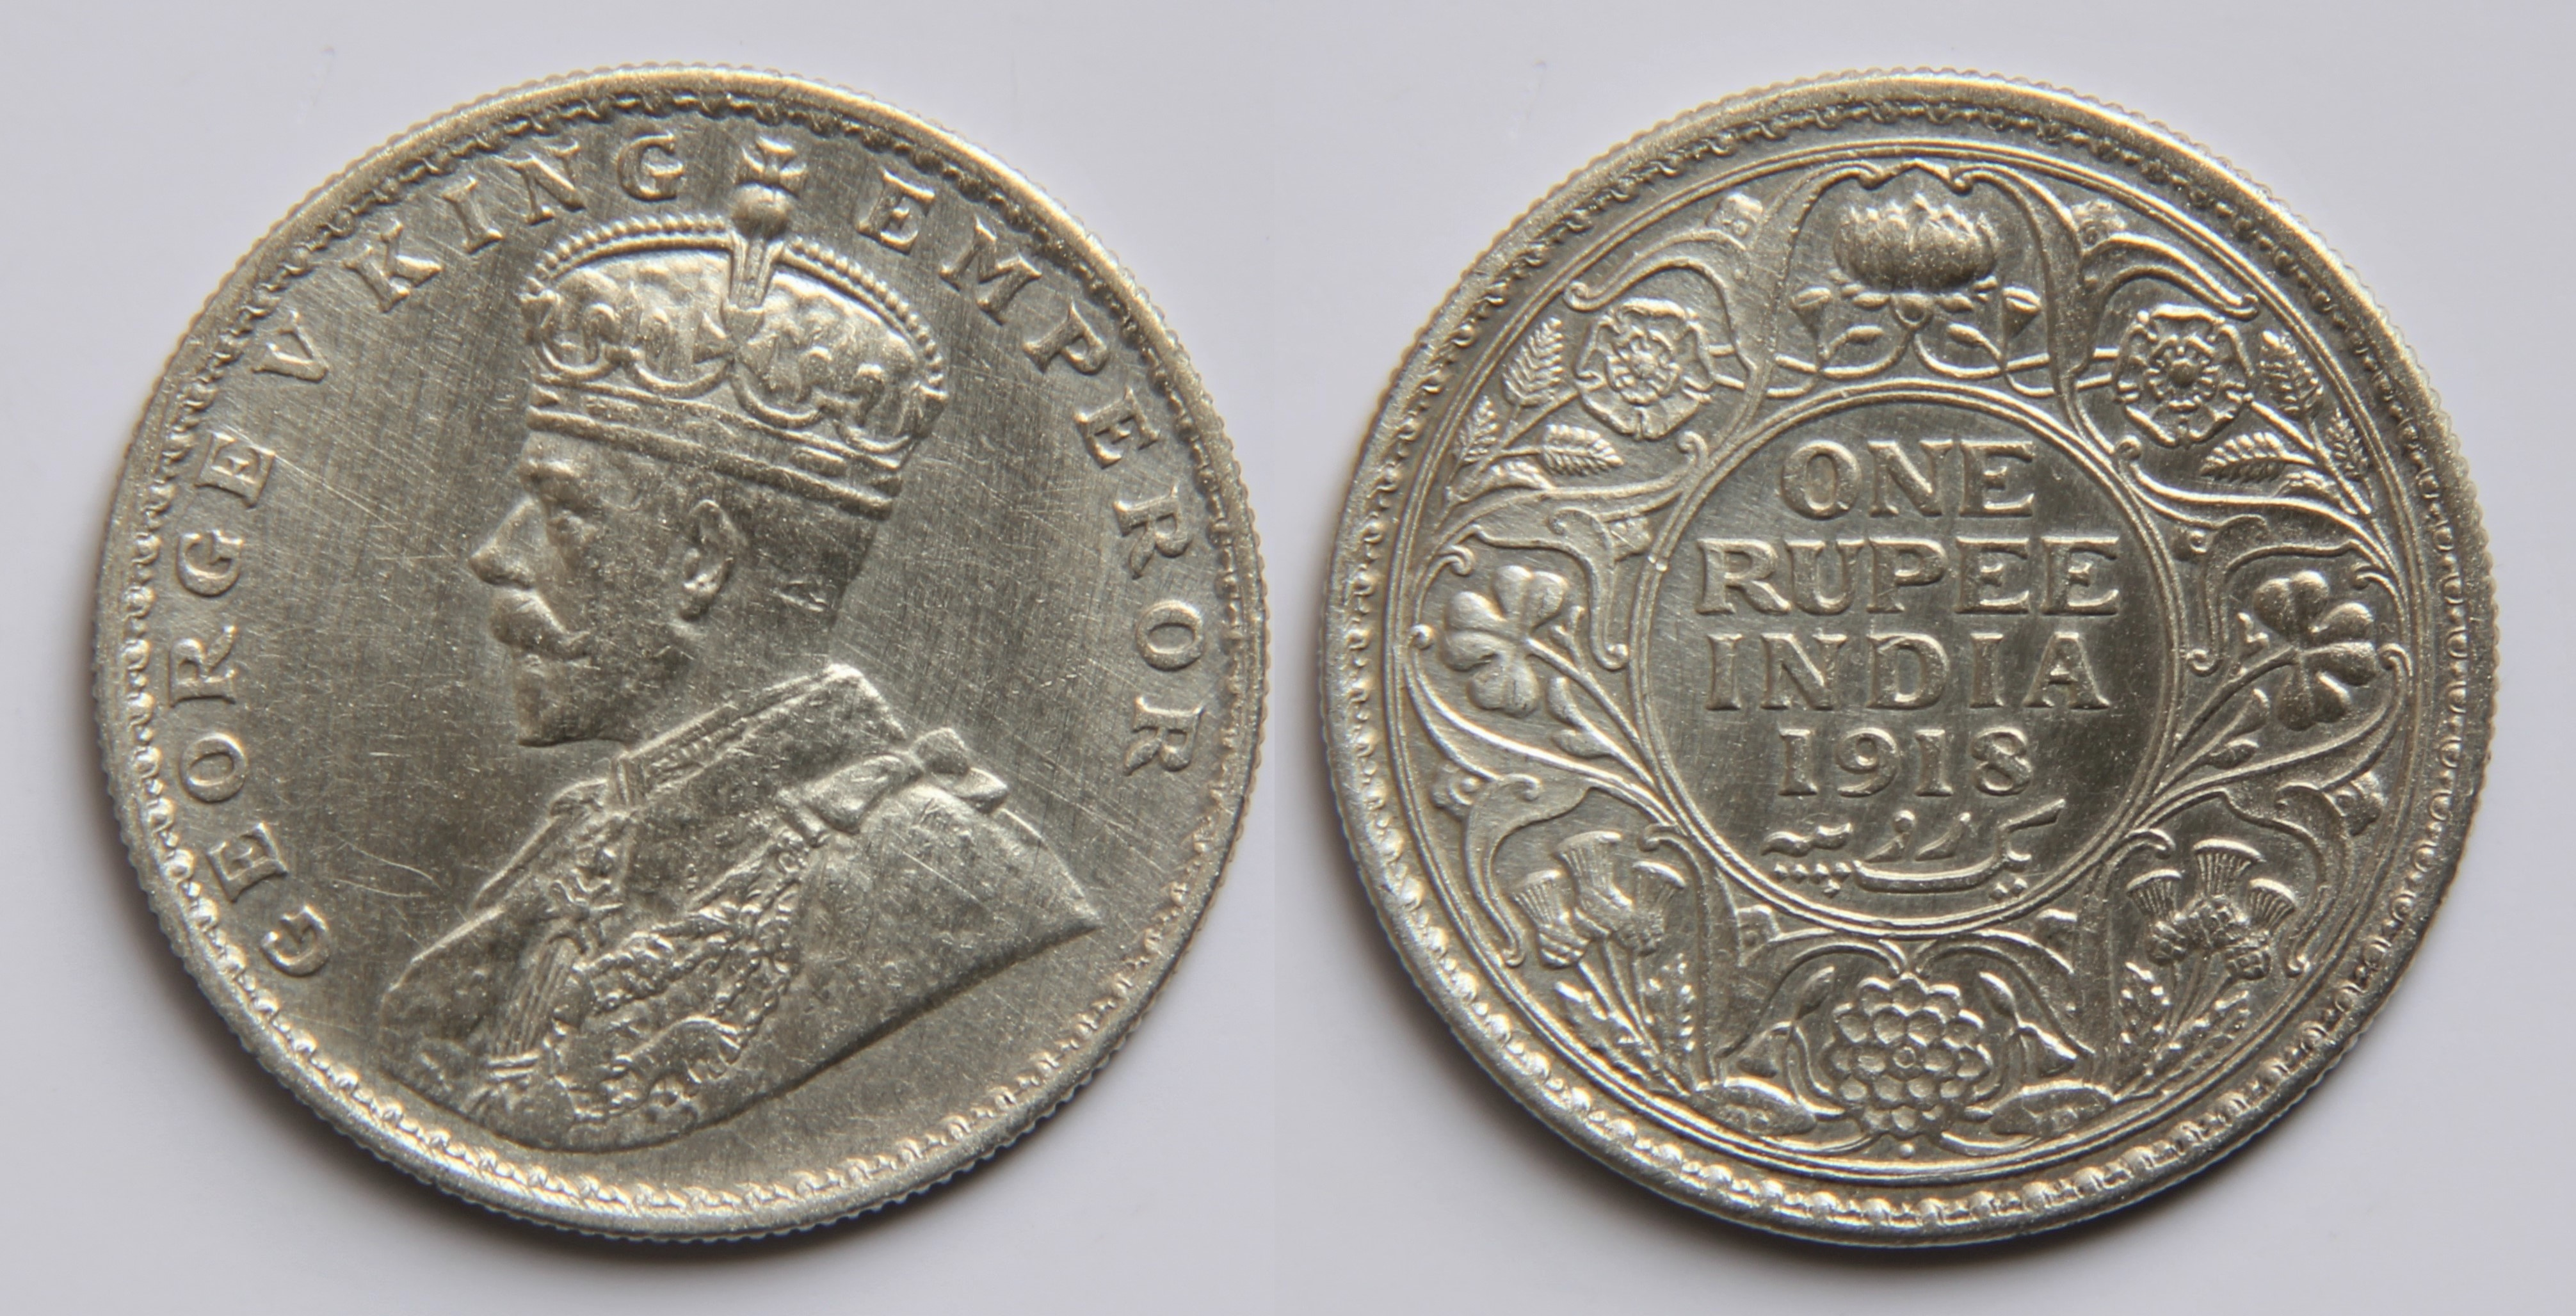 File:1 Indian rupee (1918).jpg - Wikimedia Commons